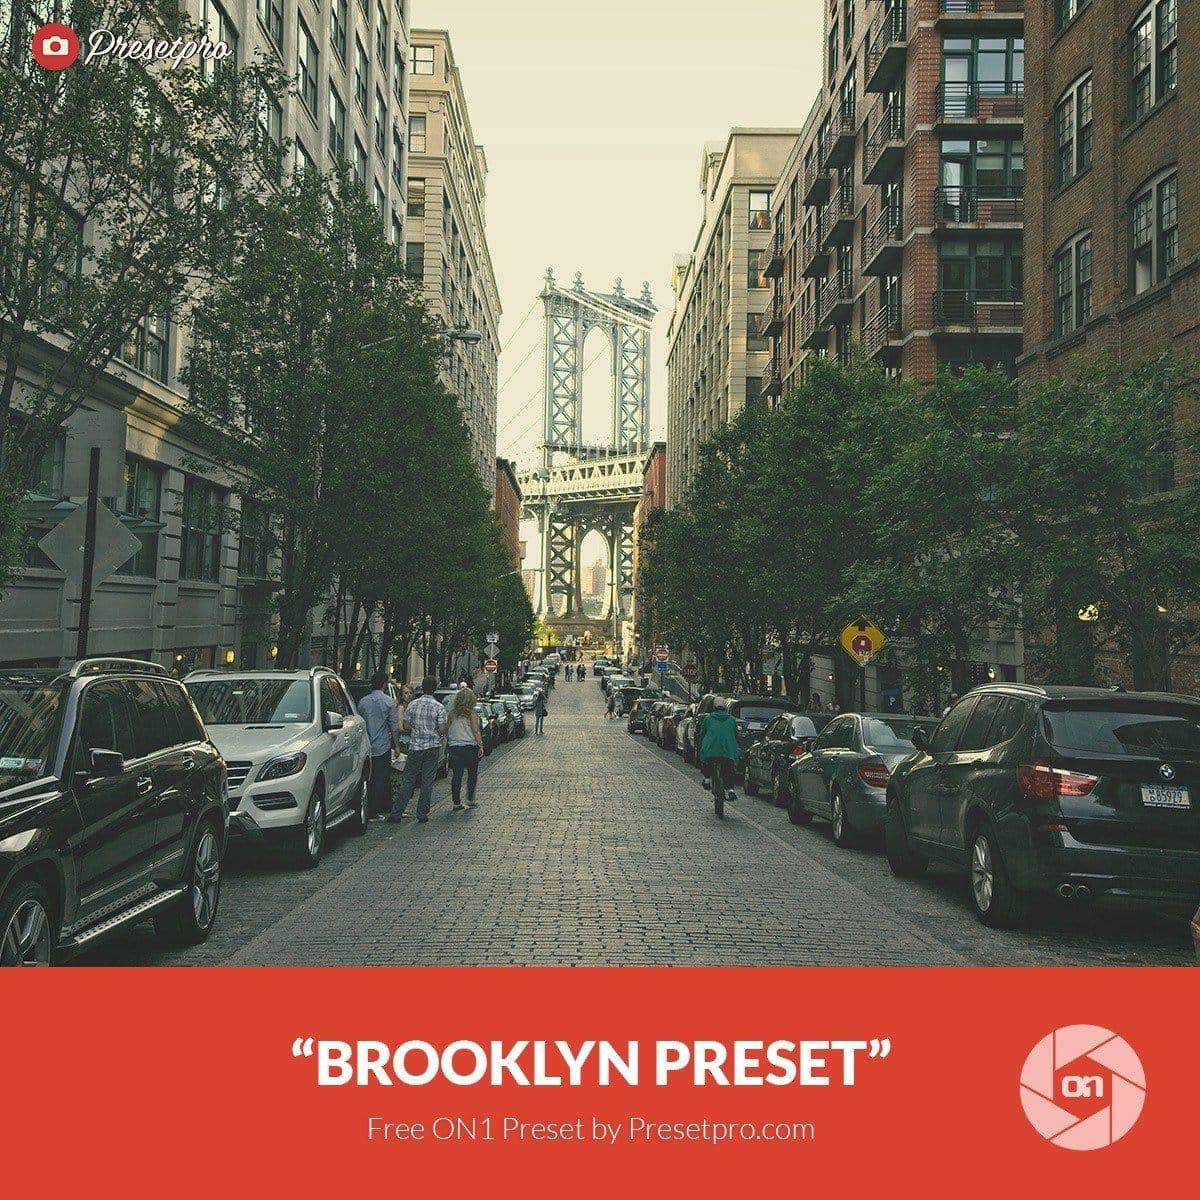 Free-On1-Preset-Brooklyn-Presetpro.com